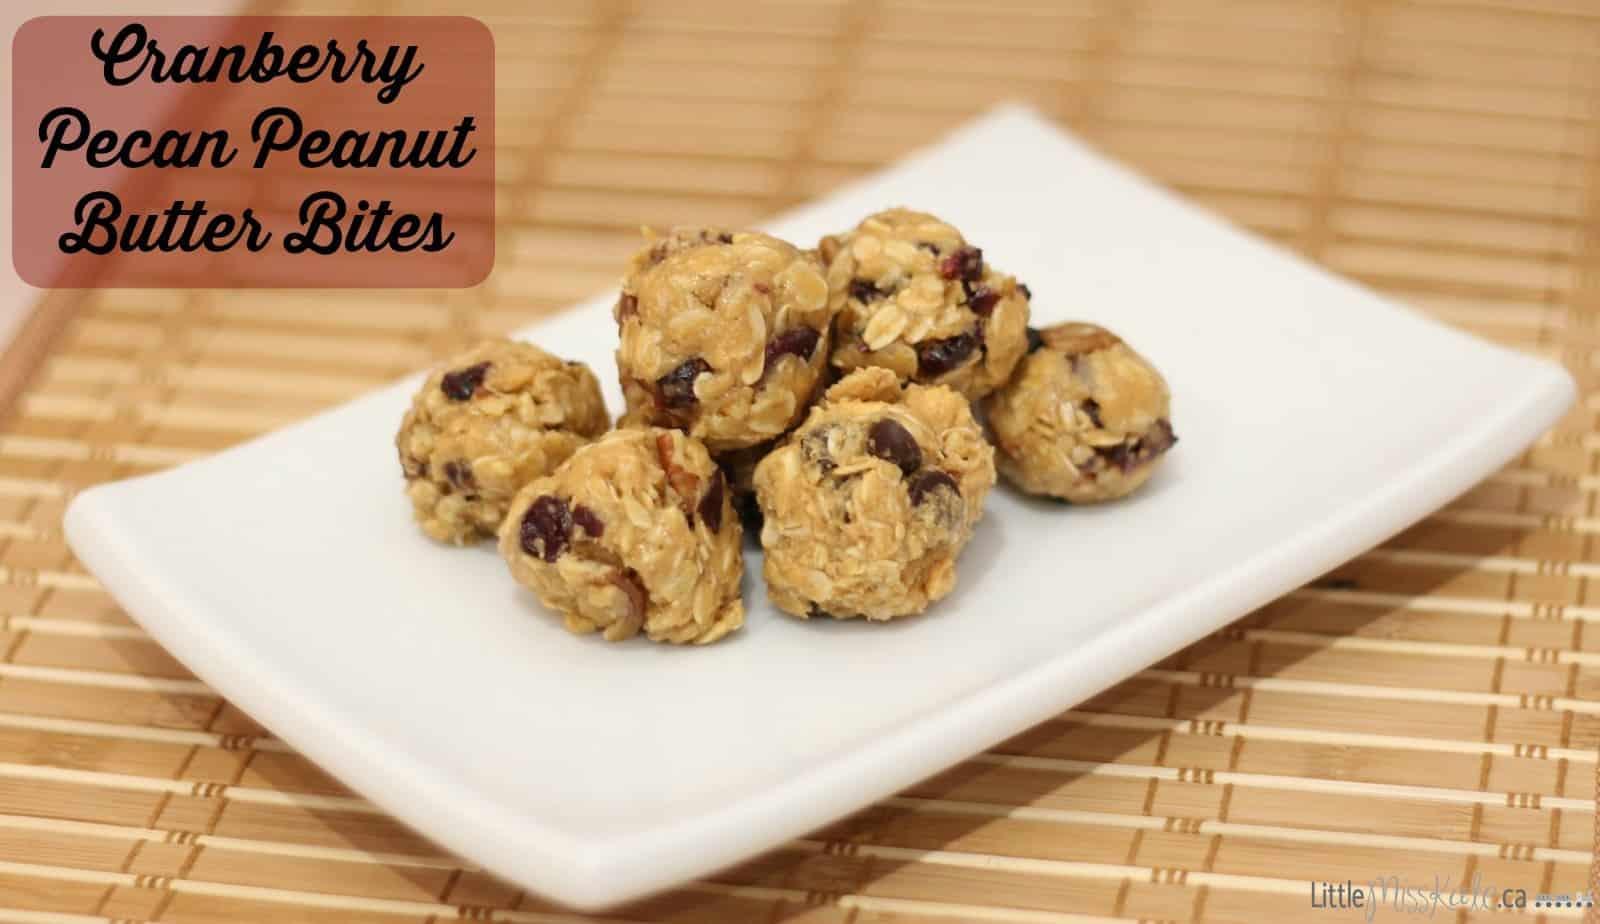 Cranberry Pecan Peanut Butter Snack Bites Recipe